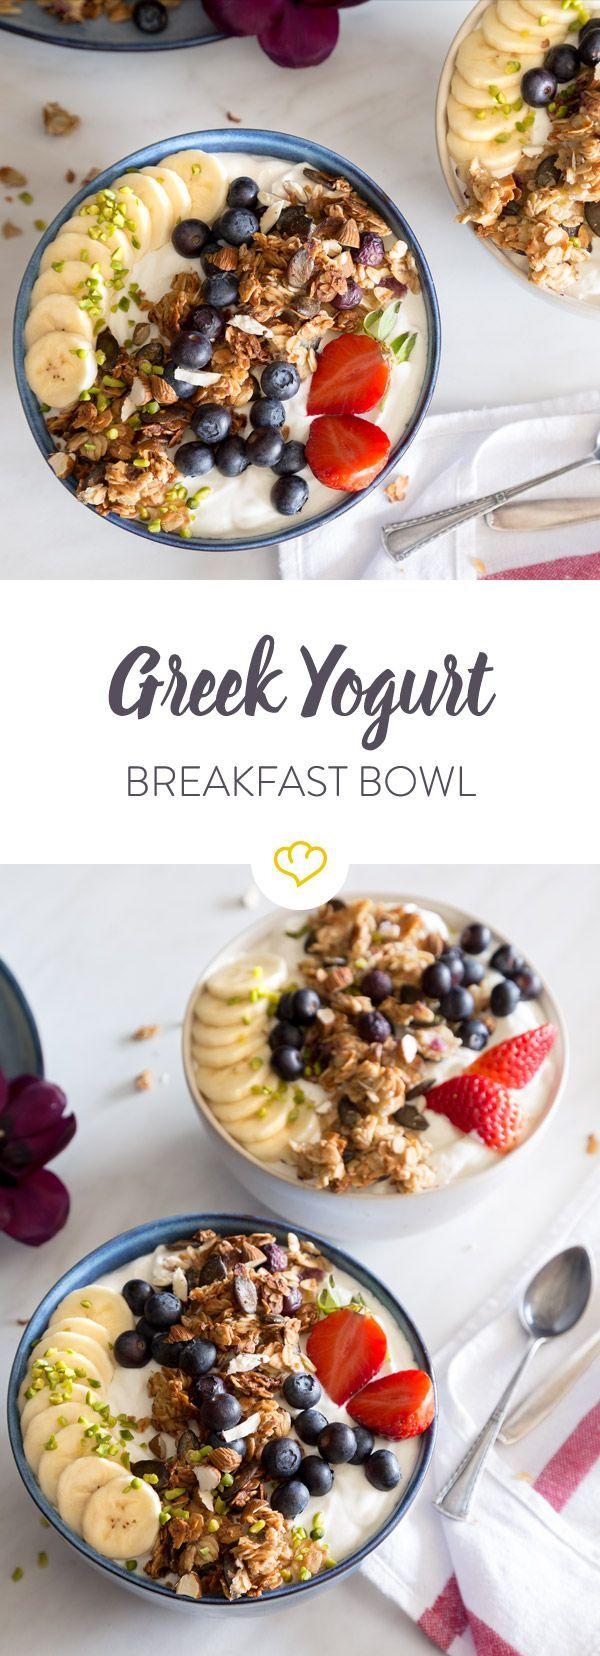 Joghurt frisch aus dem Olymp: 5 Greek Yogurt Bowls